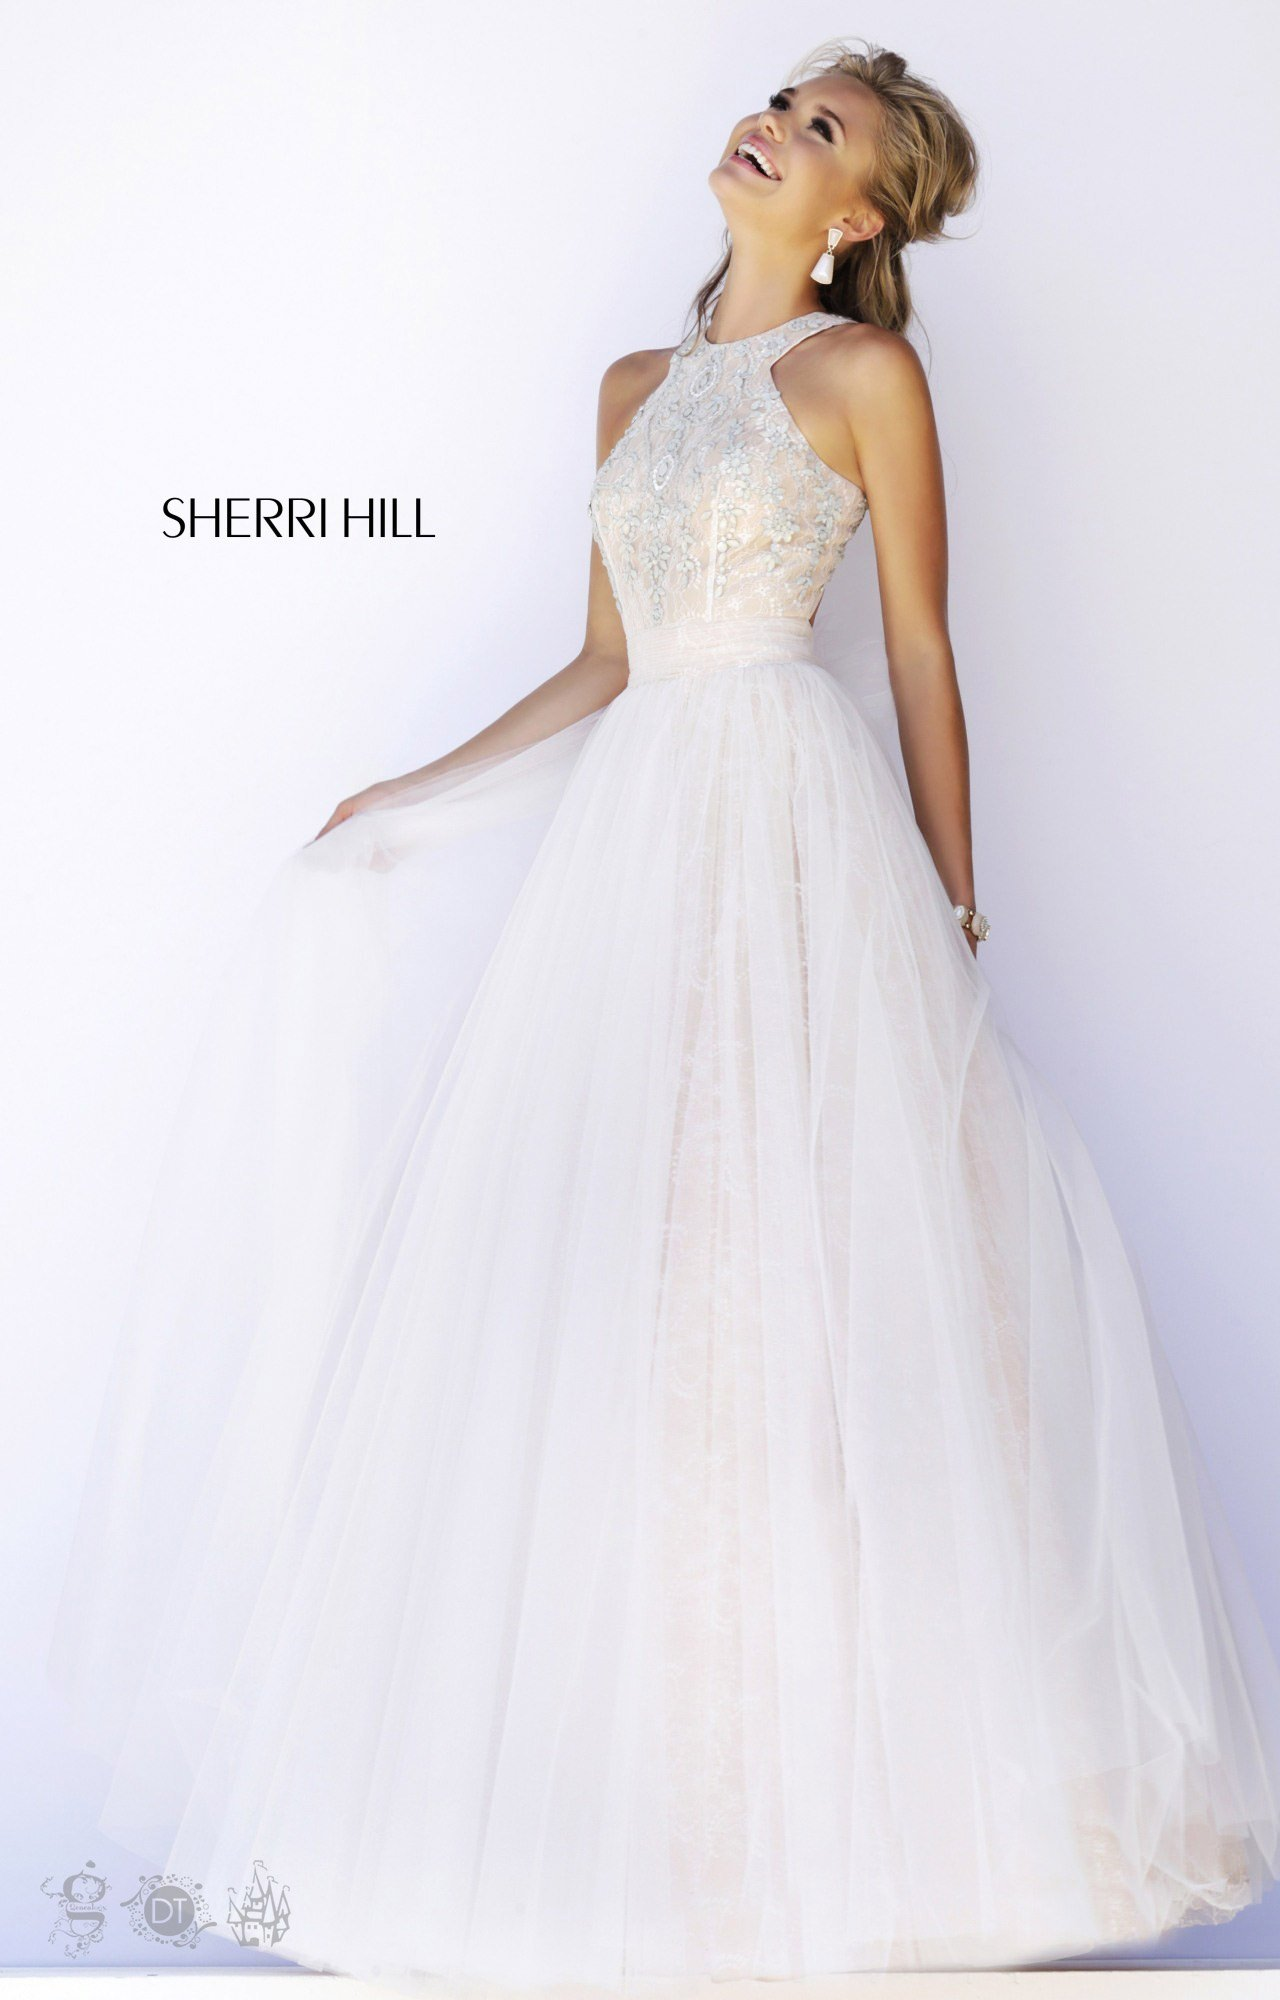 Sherri Hill 32218 - Halter Top Ball Gown Prom Dress